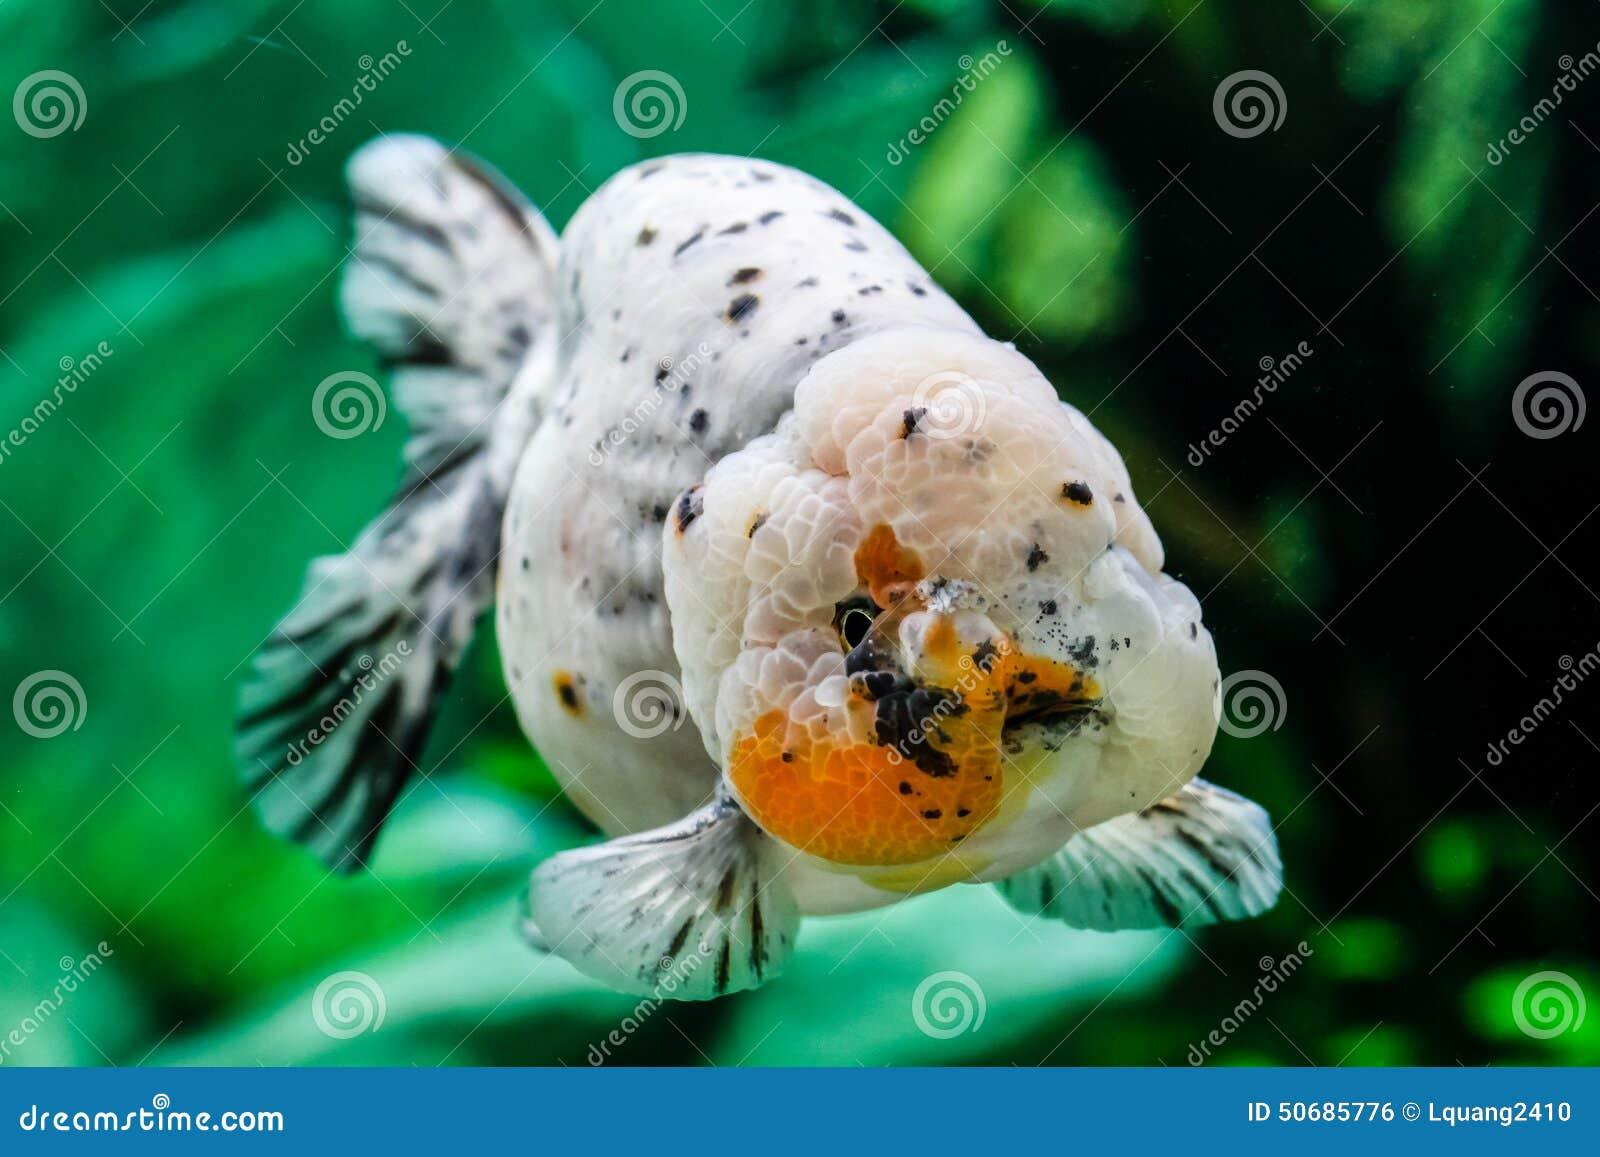 Download 关闭在水族馆的金鱼 库存照片. 图片 包括有 敌意, 结算, bubblegum, 特写镜头, 水生, 金子 - 50685776